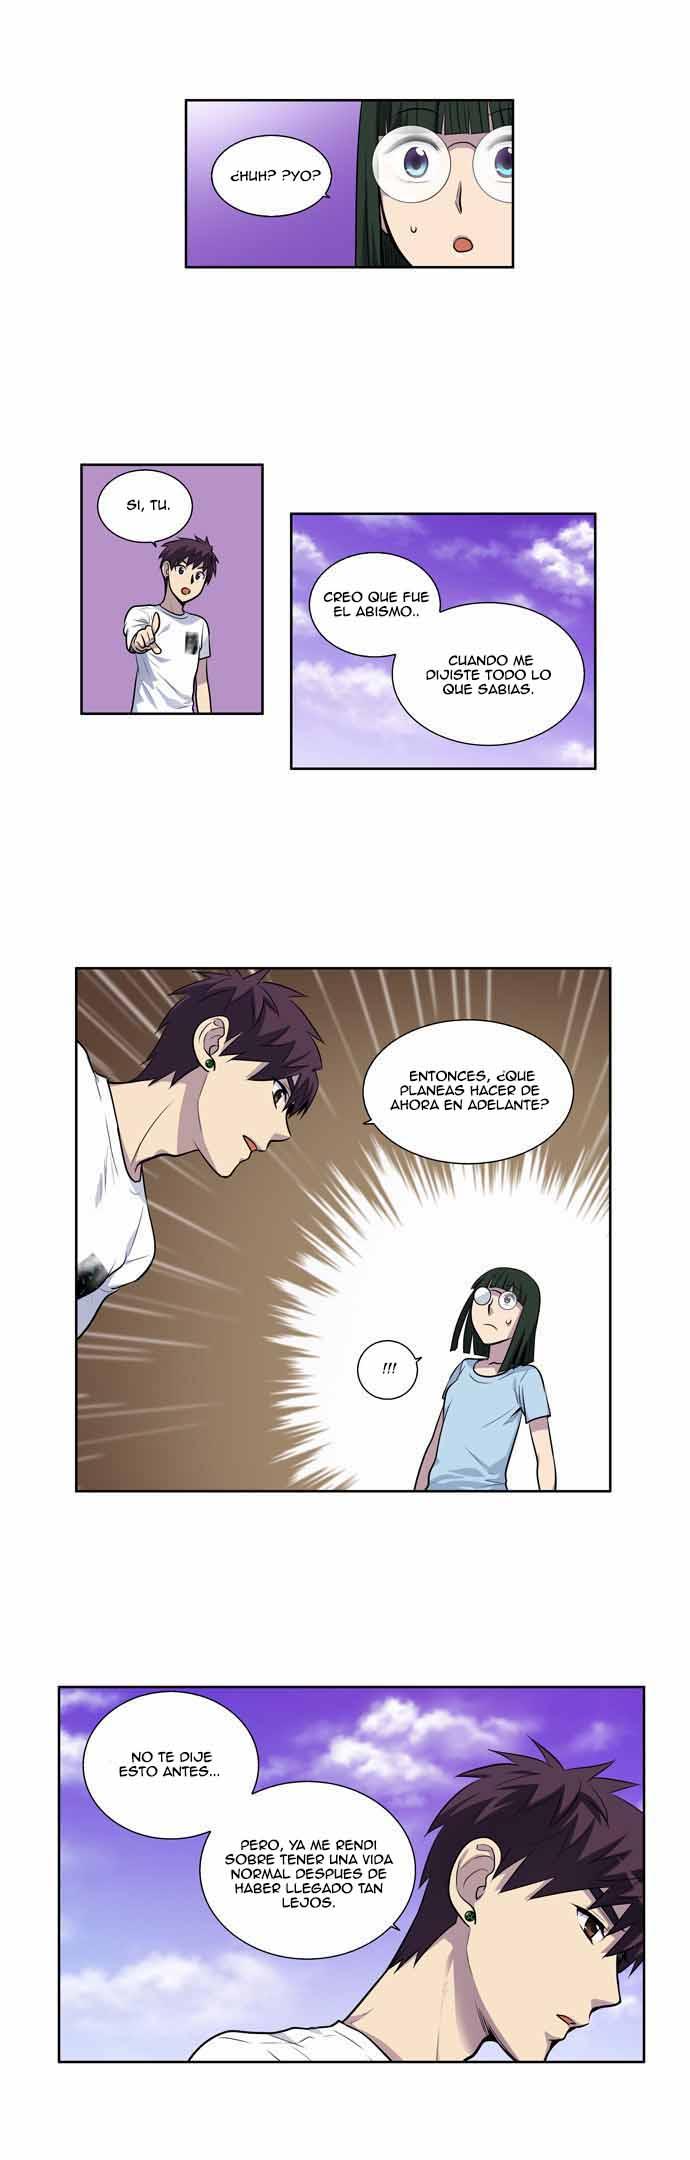 http://c5.ninemanga.com/es_manga/61/1725/430712/642c30b85aab4b8e49e795605bf6f368.jpg Page 4